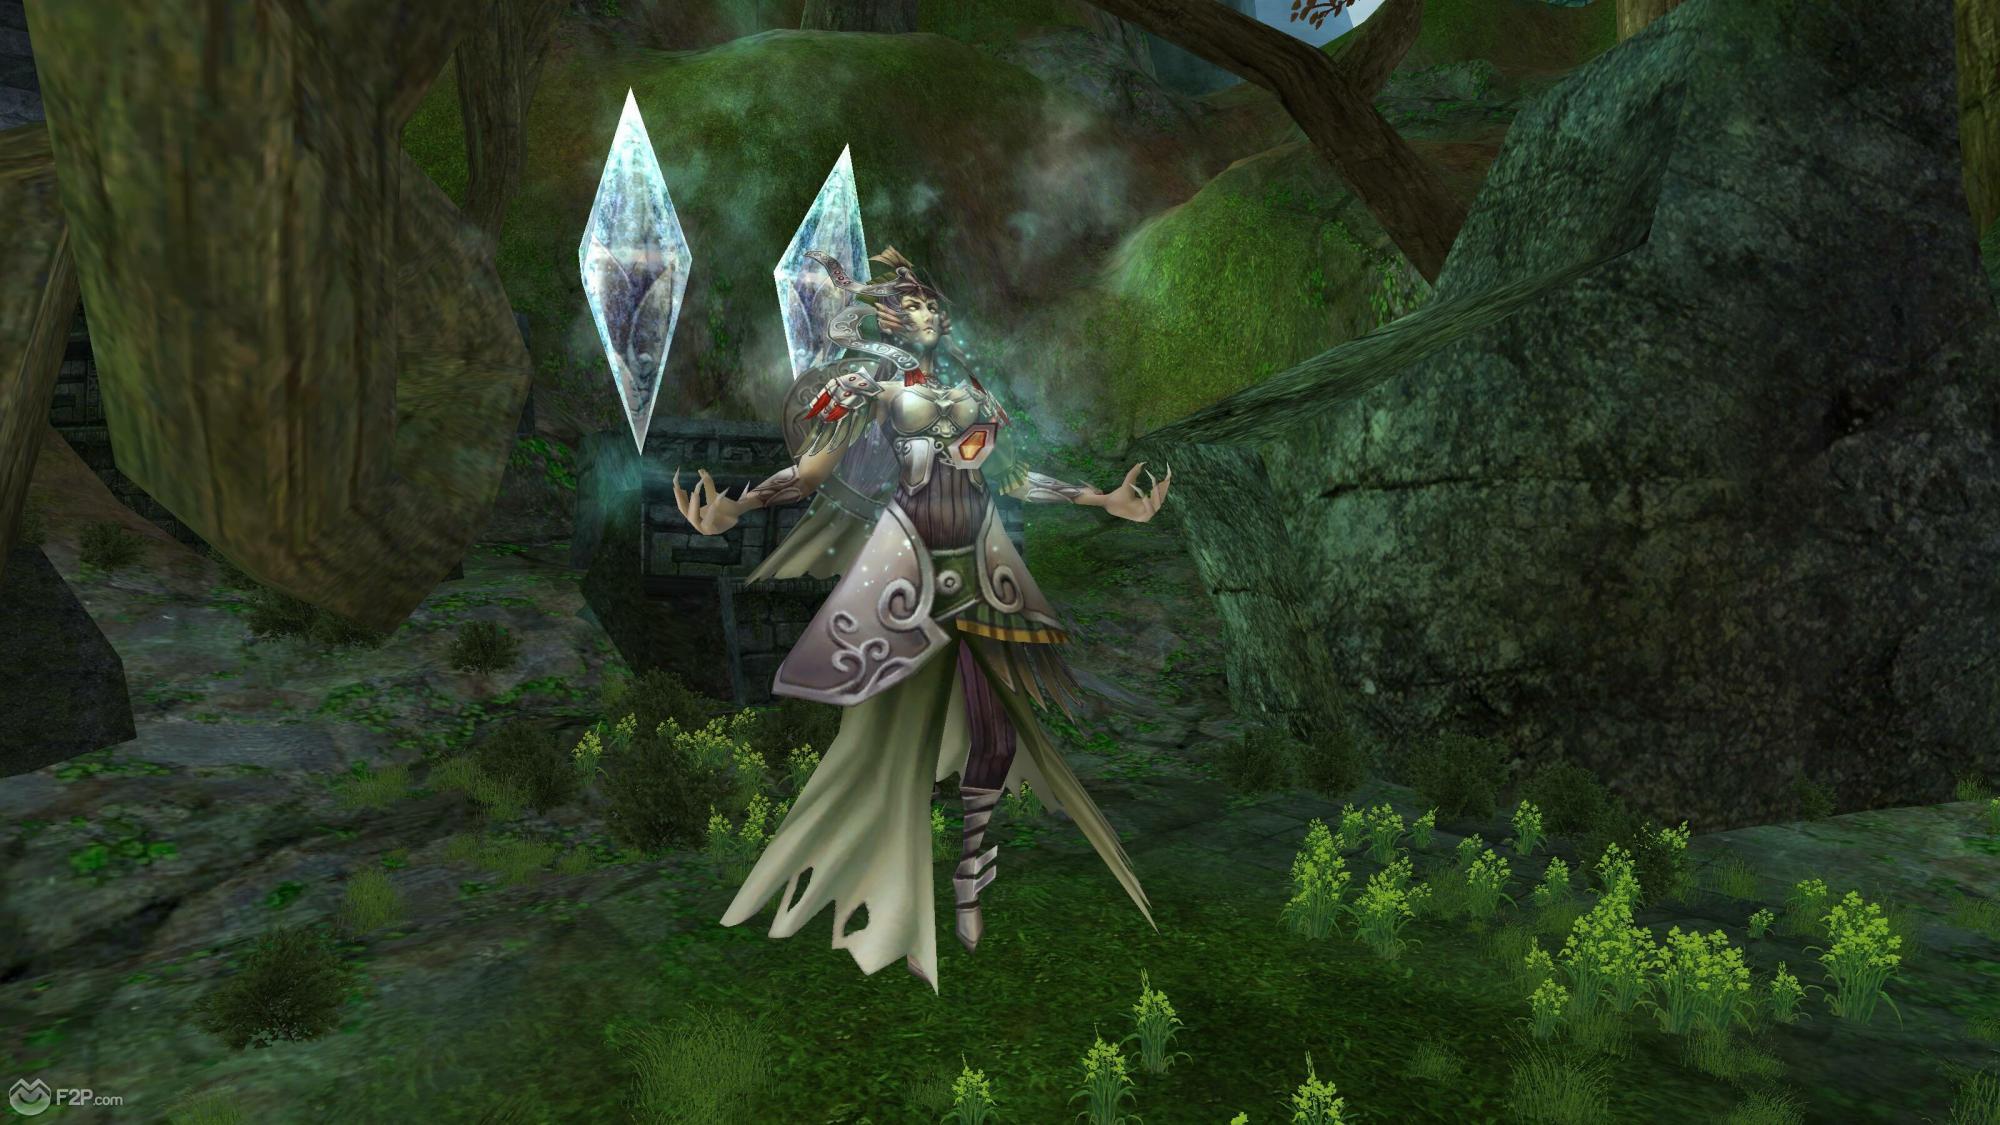 Click image for larger version.Name:Jade Dynasty 95.jpgViews:244Size:288.6 KBID:6058